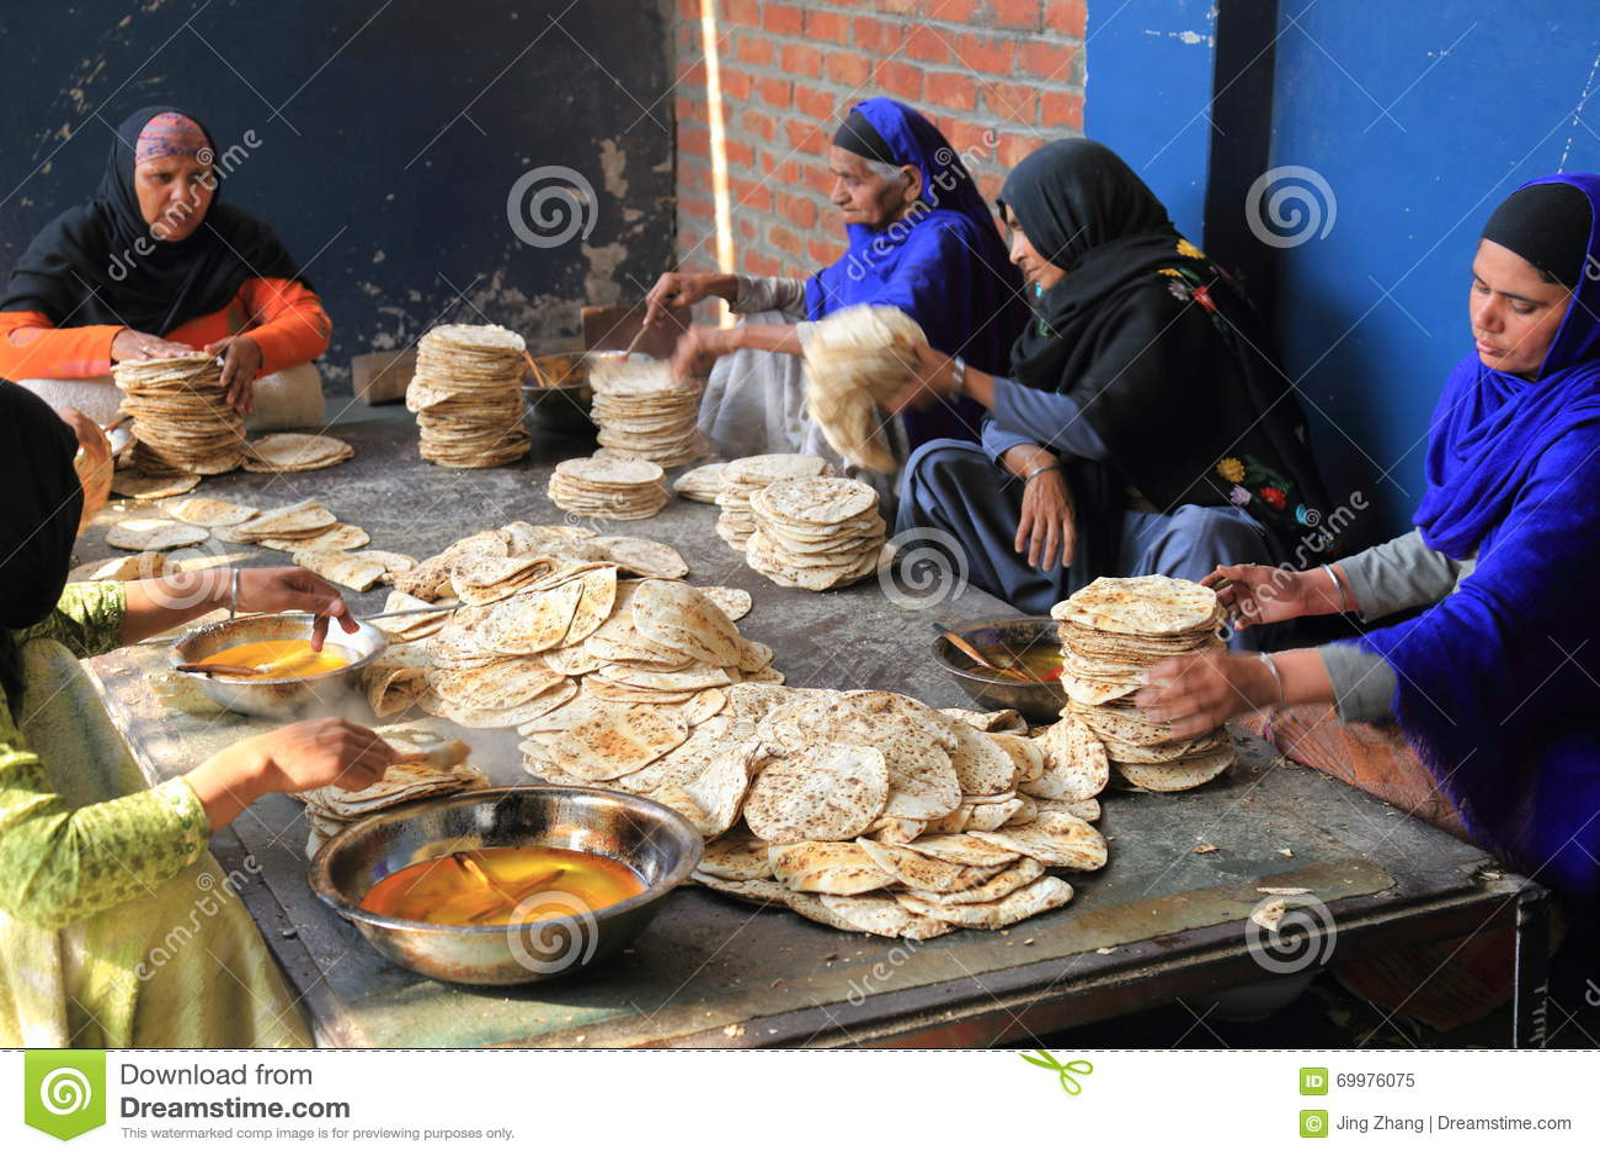 Street kitchen of the world